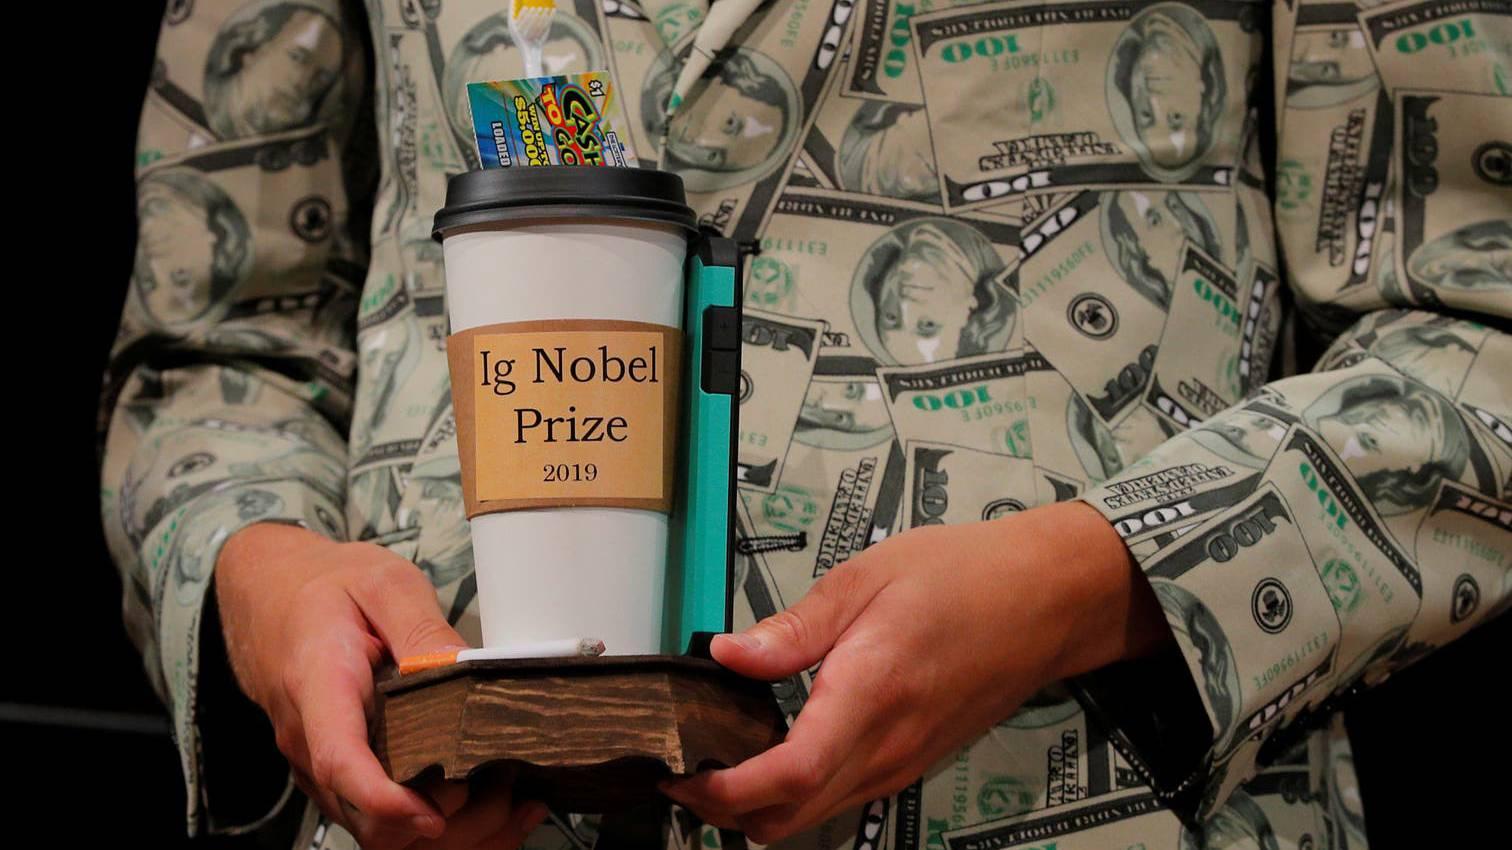 Ig-Nobelpreis 2019